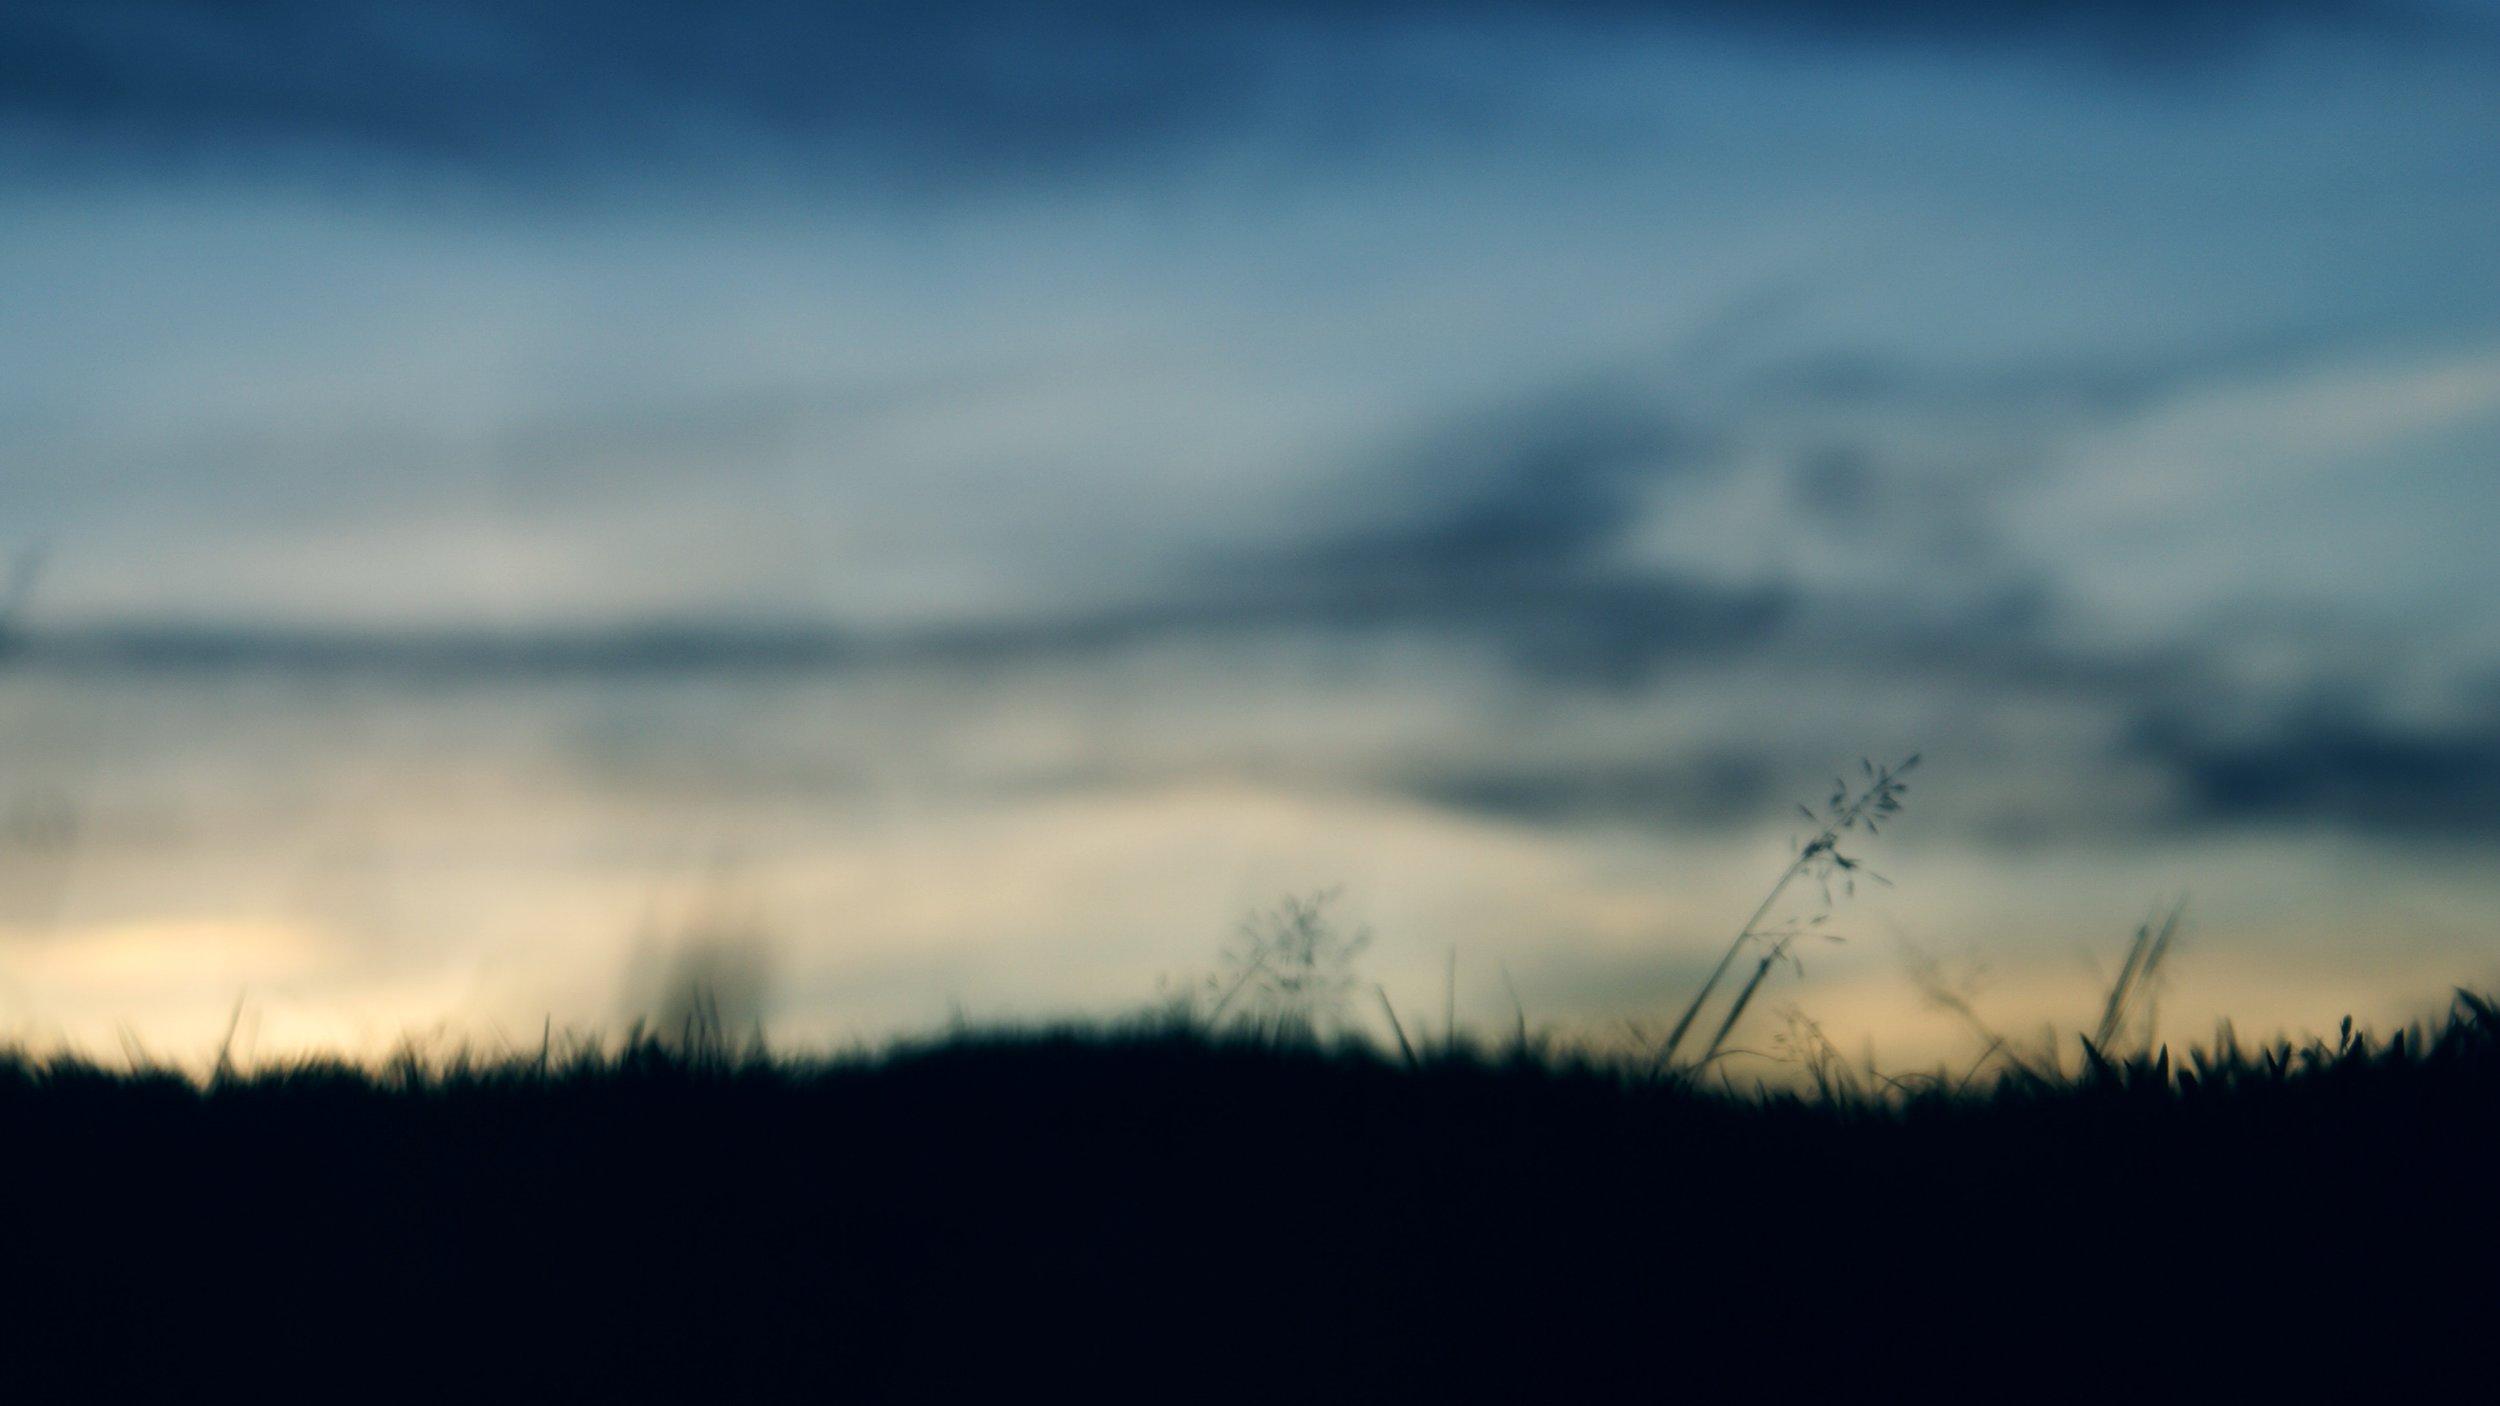 clouds-dark-dawn-426613.jpg